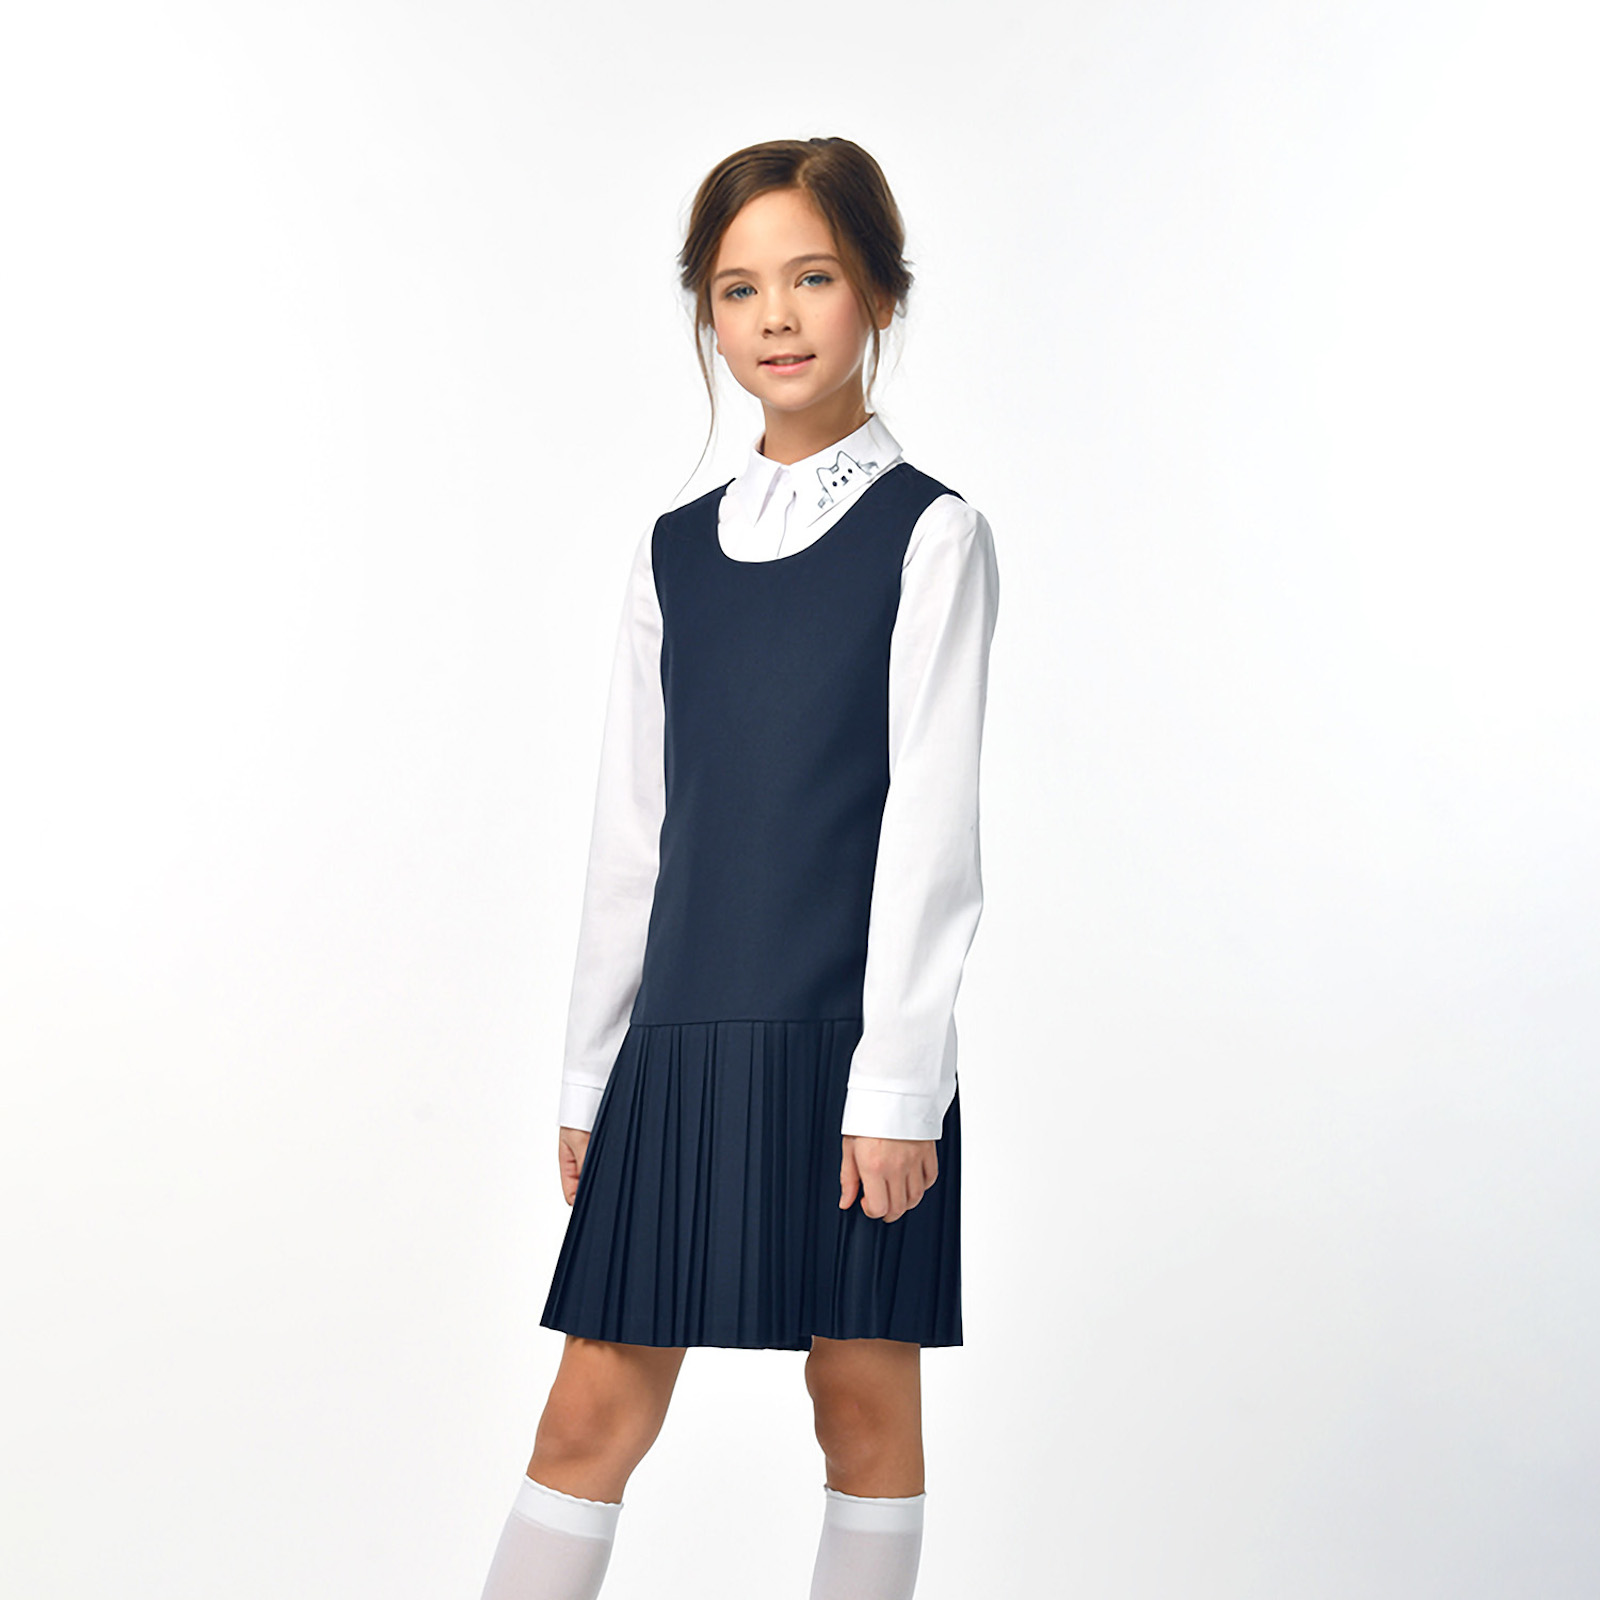 Купить 10610_plus size, Сарафан для девочек СМЕНА цв.синий 10610 р.140/72, Смена, Сарафаны для девочек